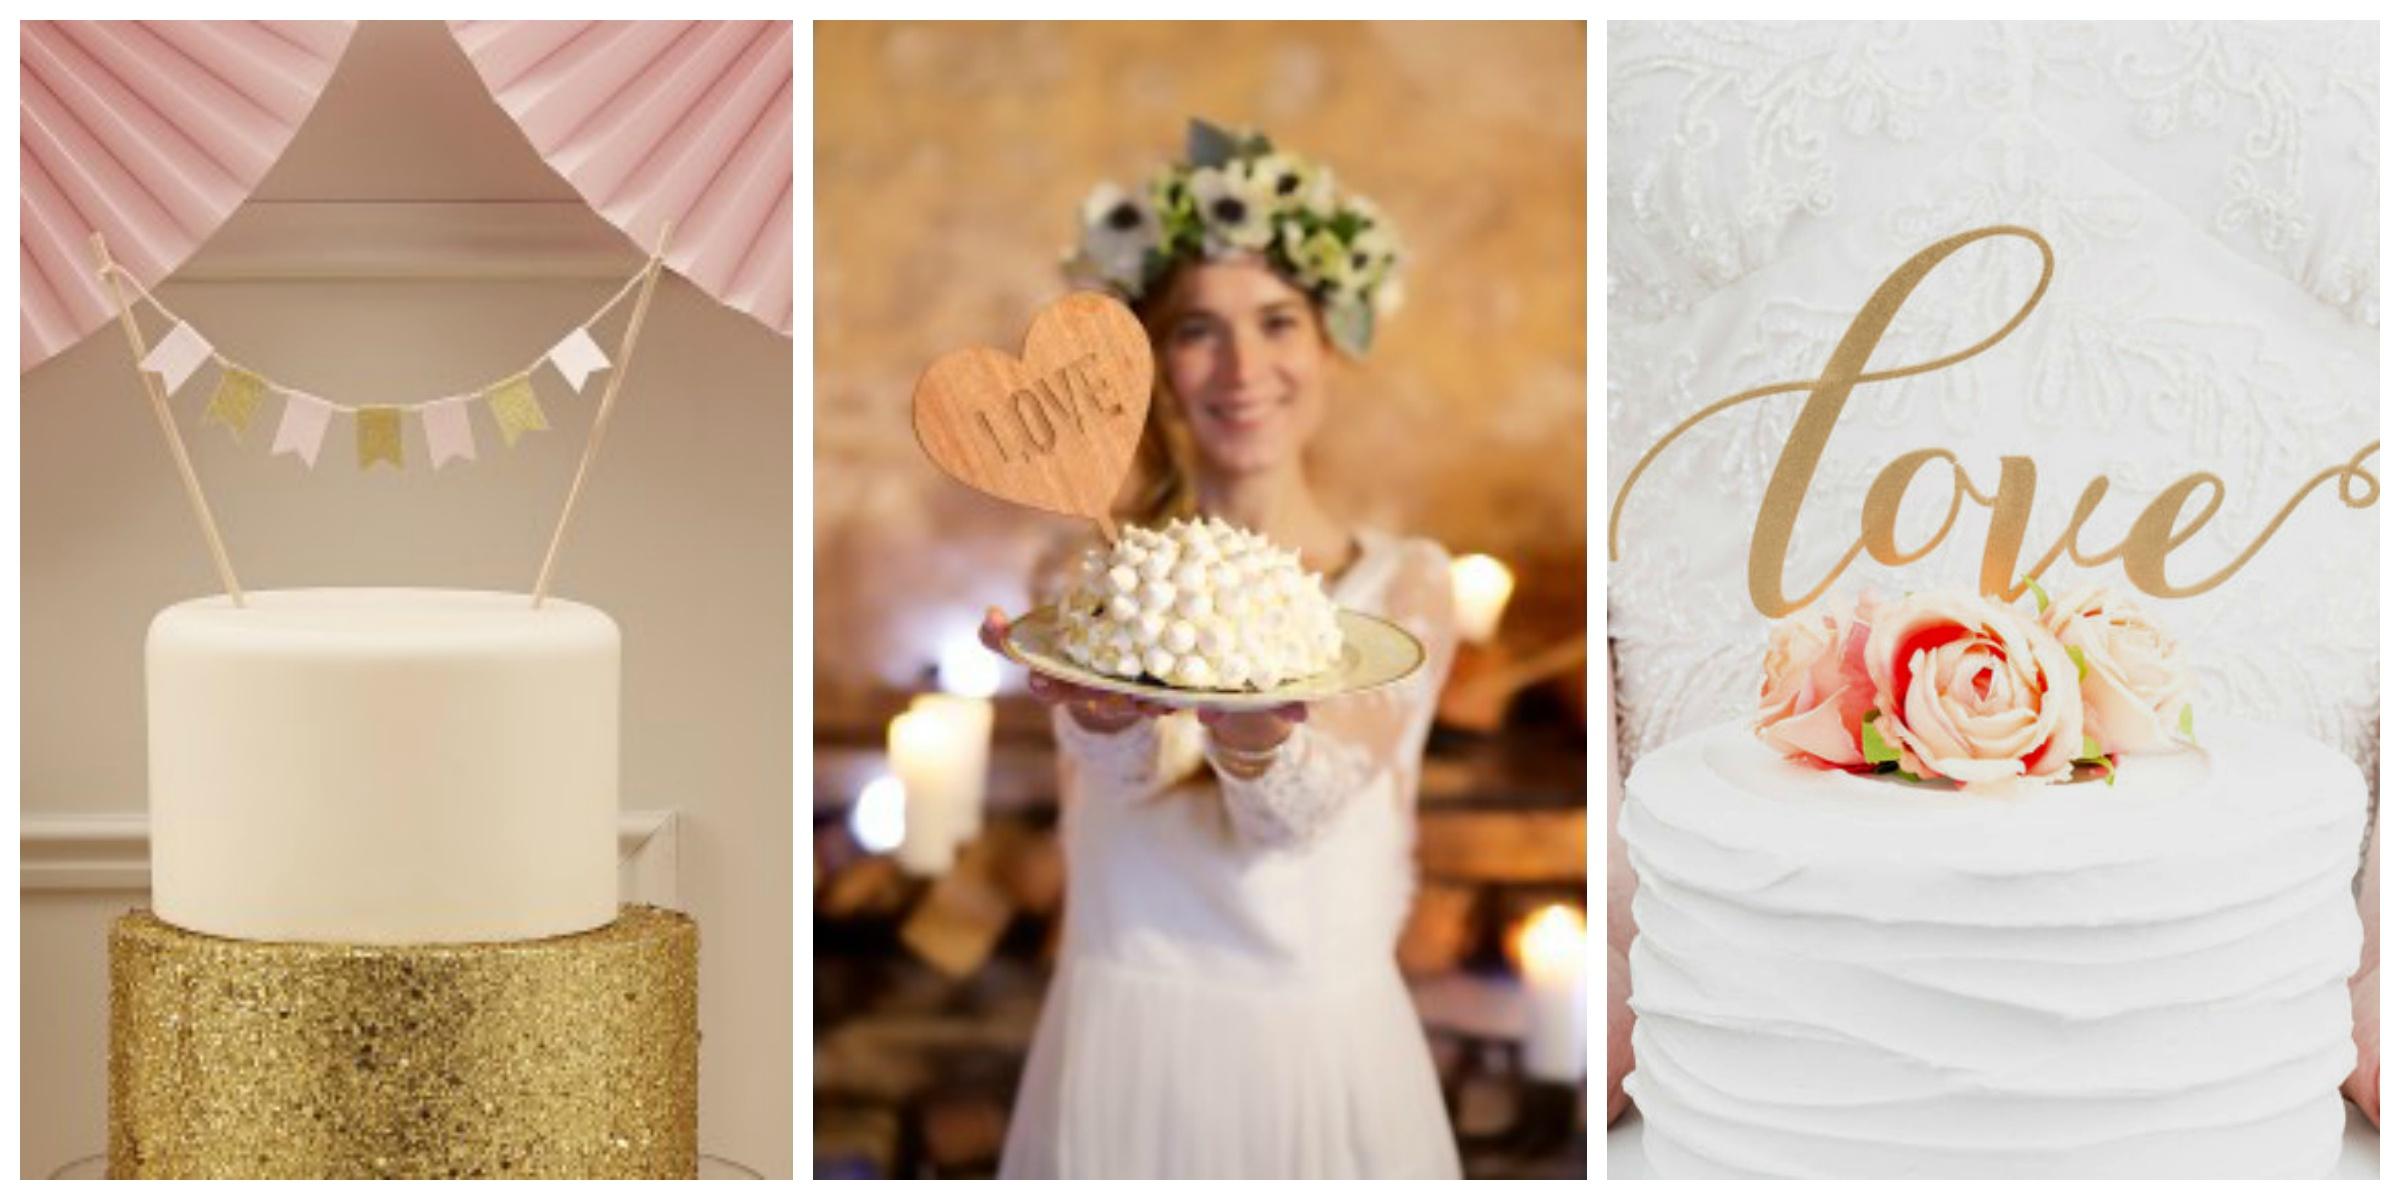 tendance-2015-figurine-gateau-mariage-cake-topper-mariage.jpg